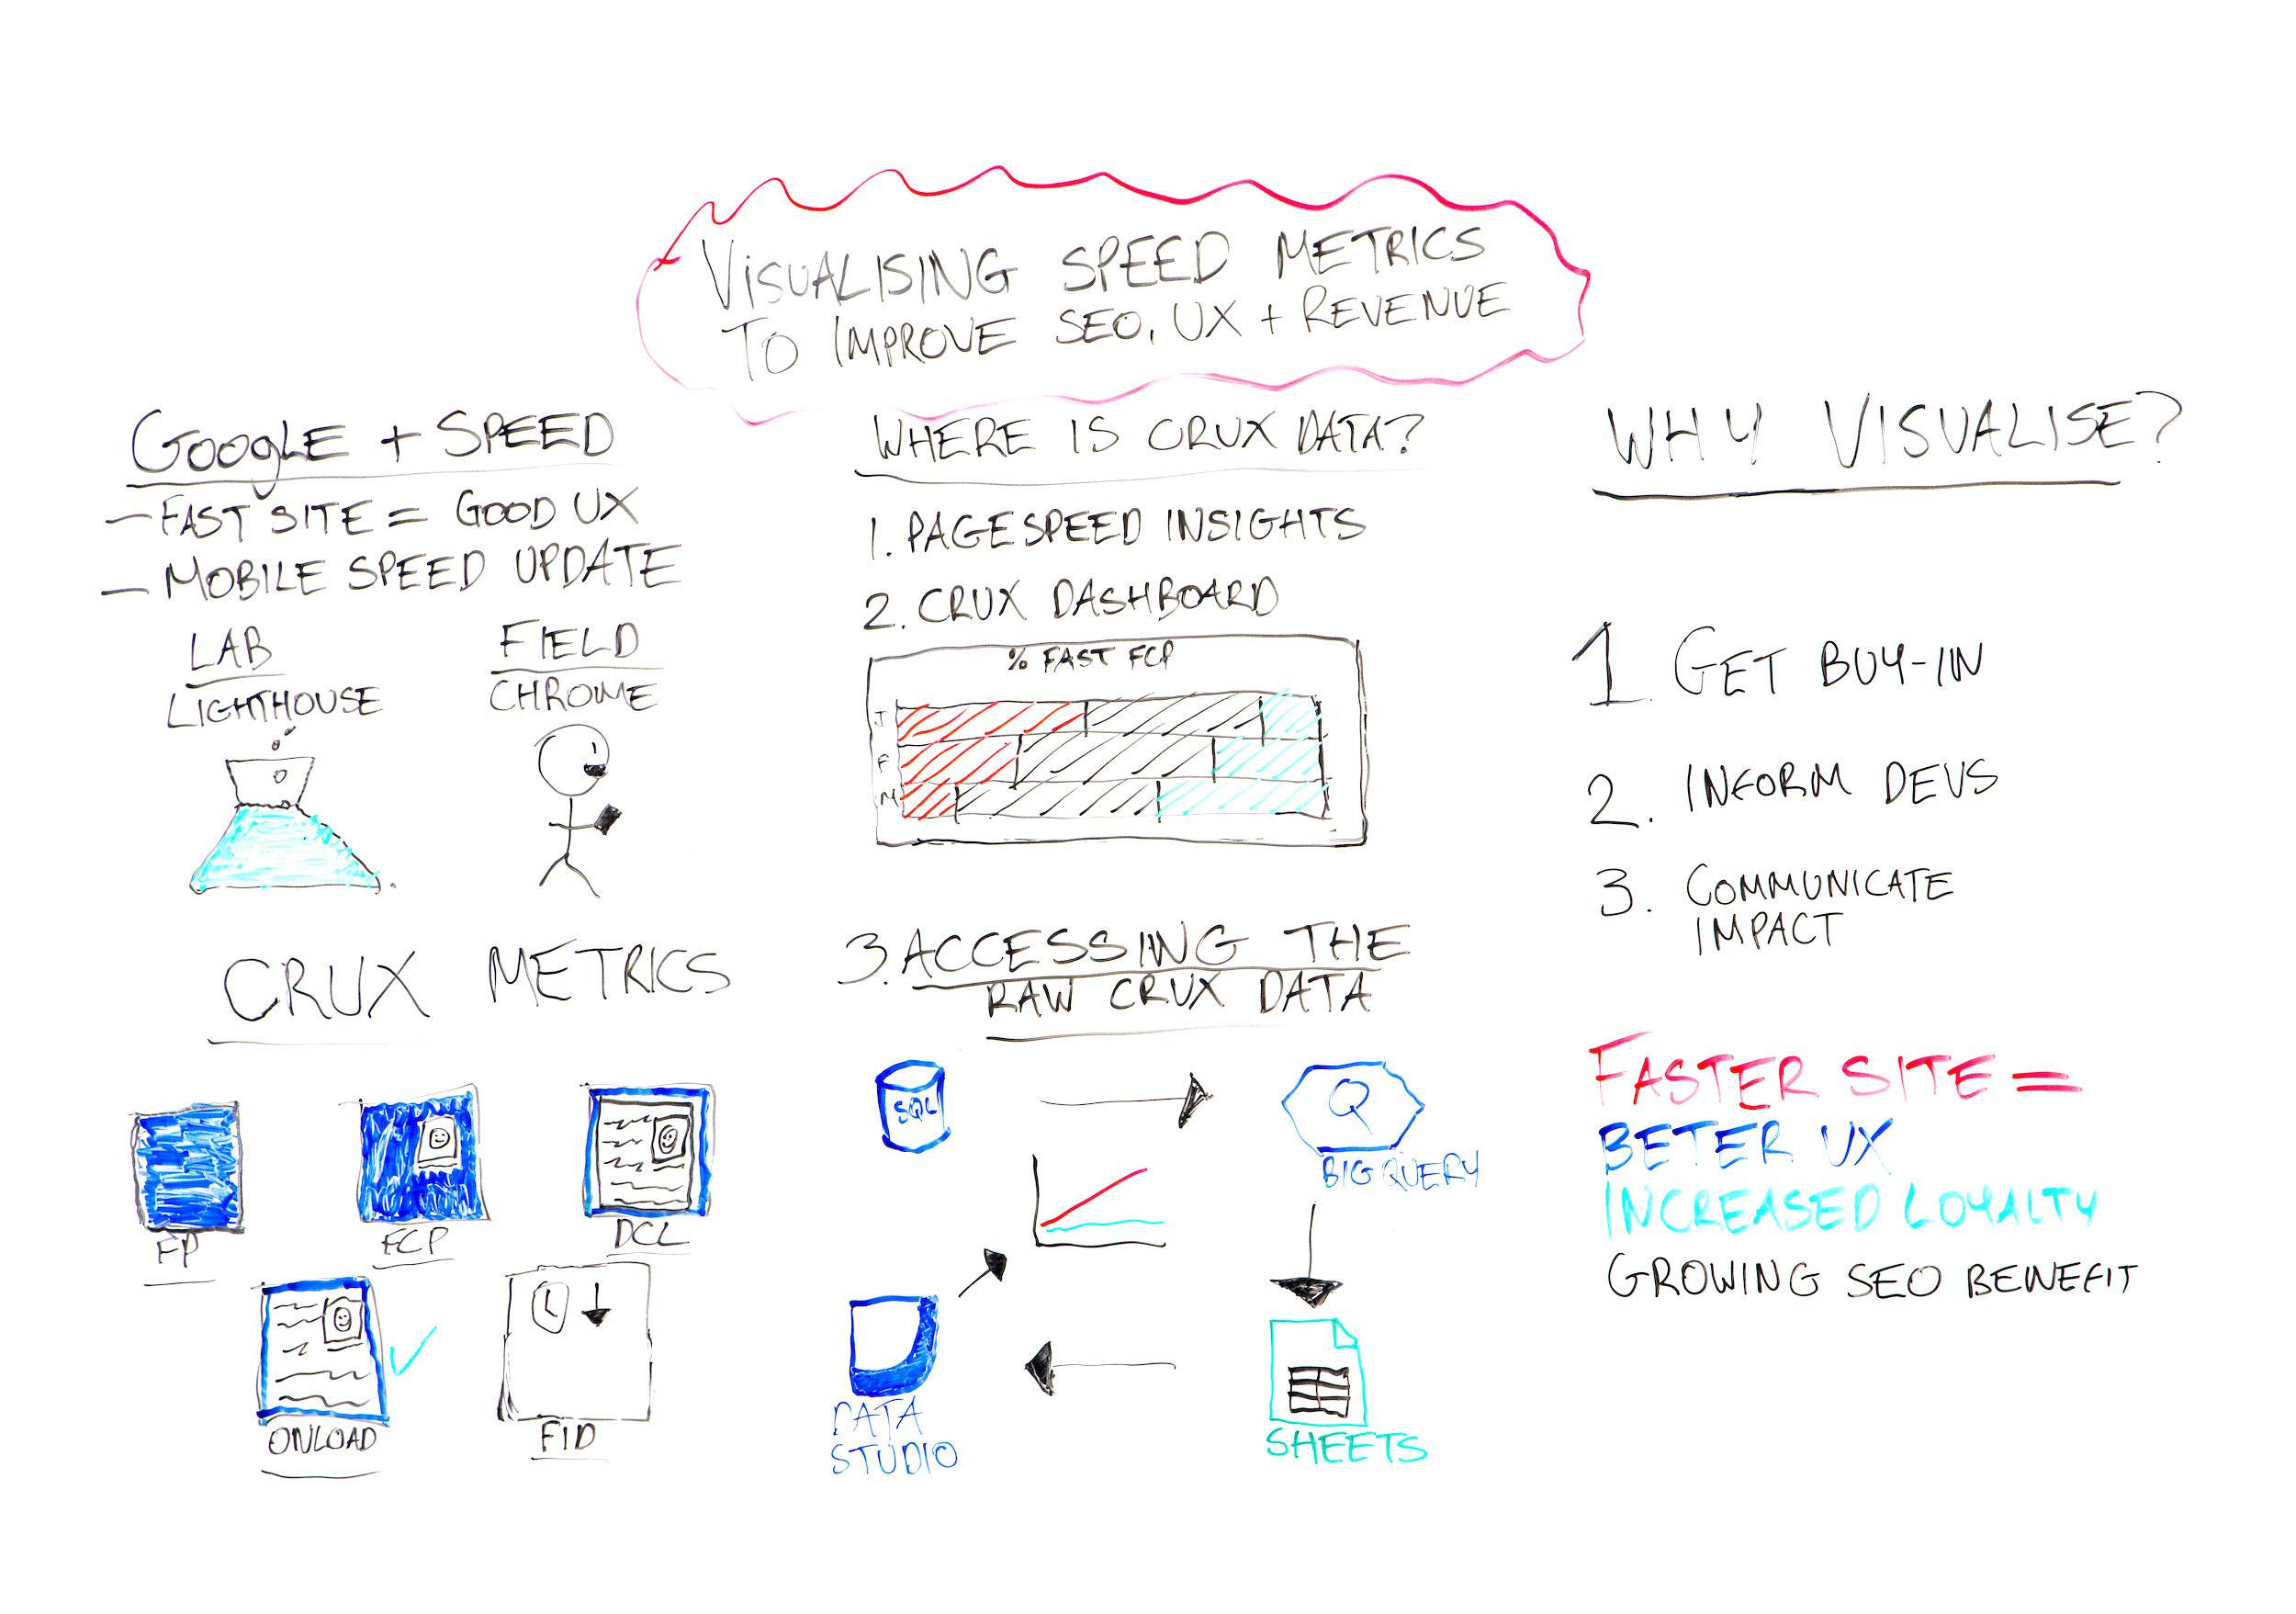 Visualizing Speed Metrics to Improve SEO, UX, &amp